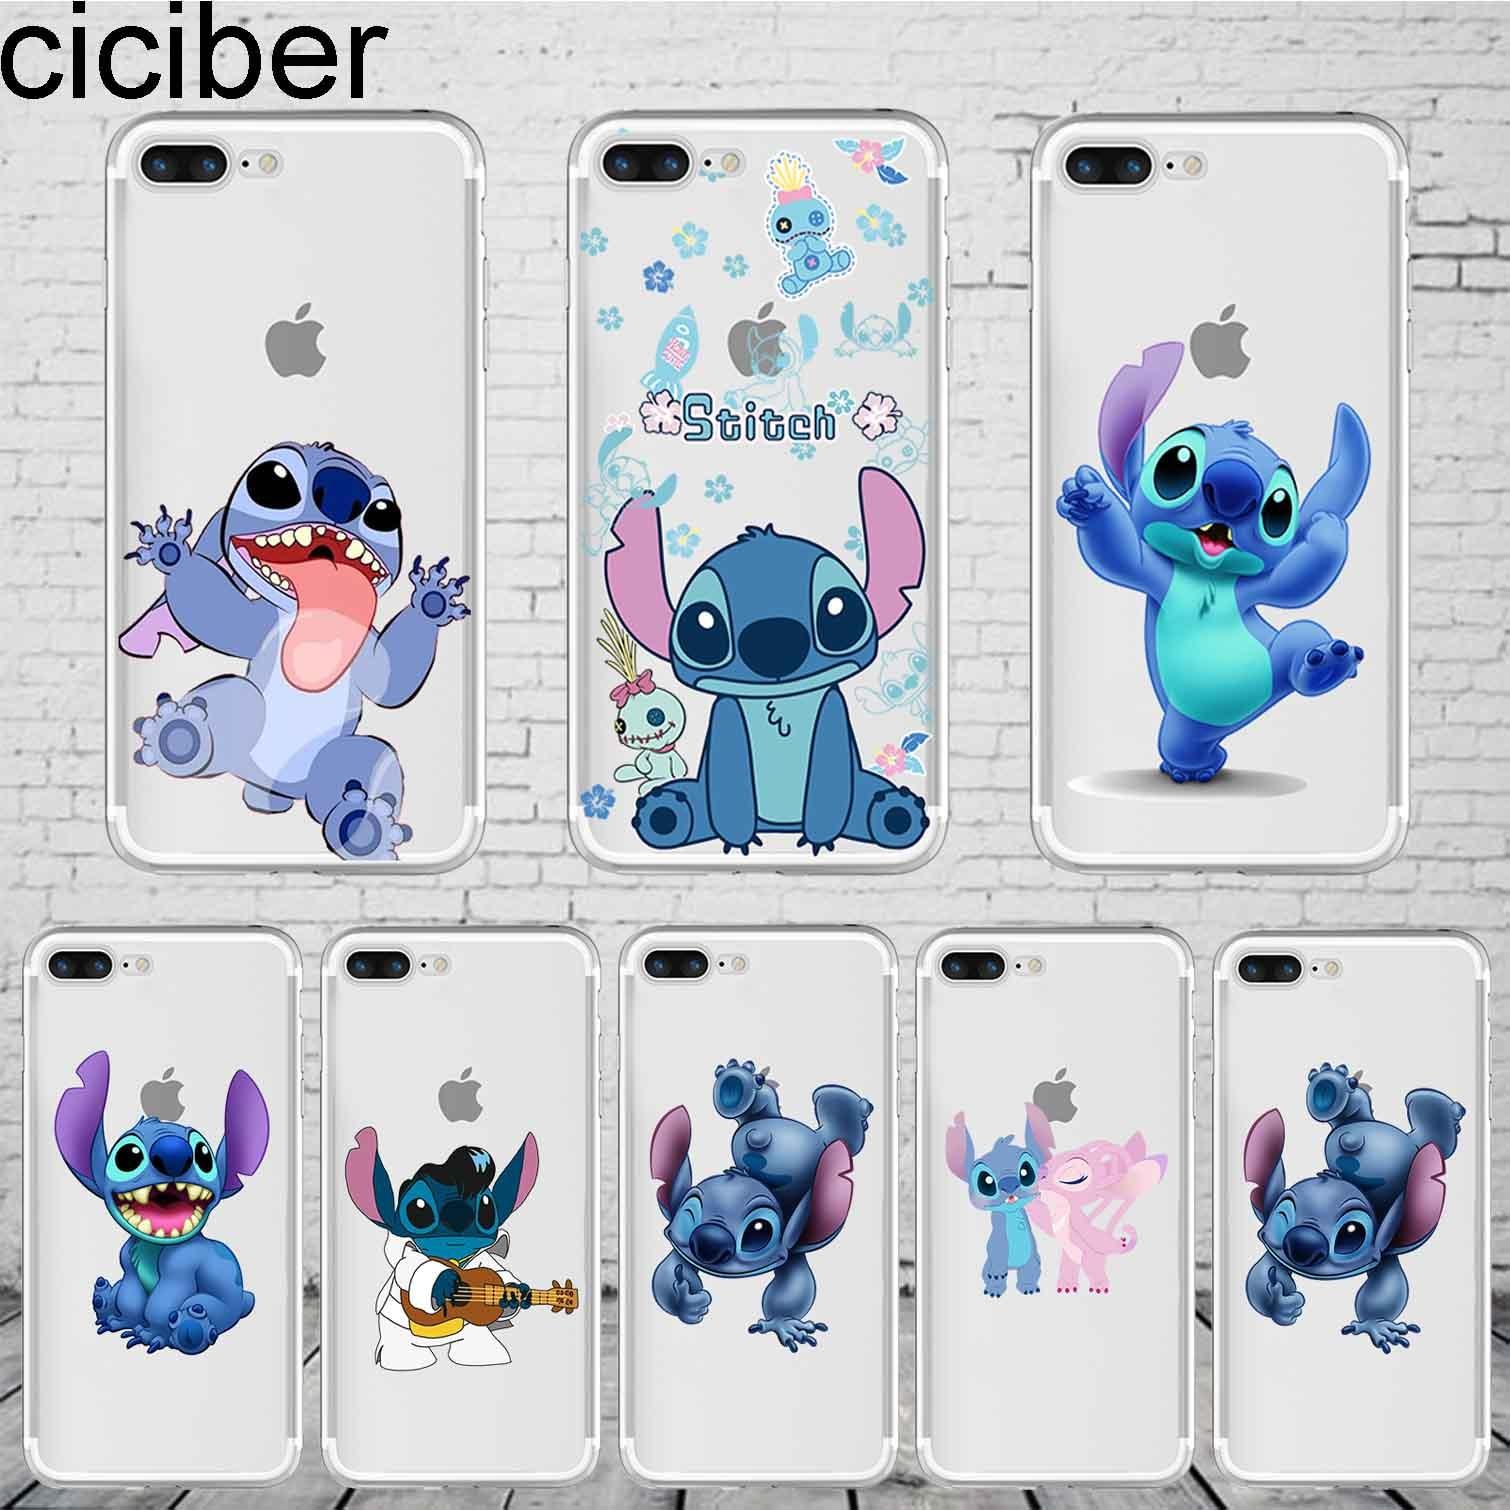 Galleria fotografica ciciber Cartoon Lovely Stich Stitch Phone Case Cover For iPhone 7 8 Plus X XR XS Max Cases 6 6S Plus 5 5S SE Coque Soft Silicone